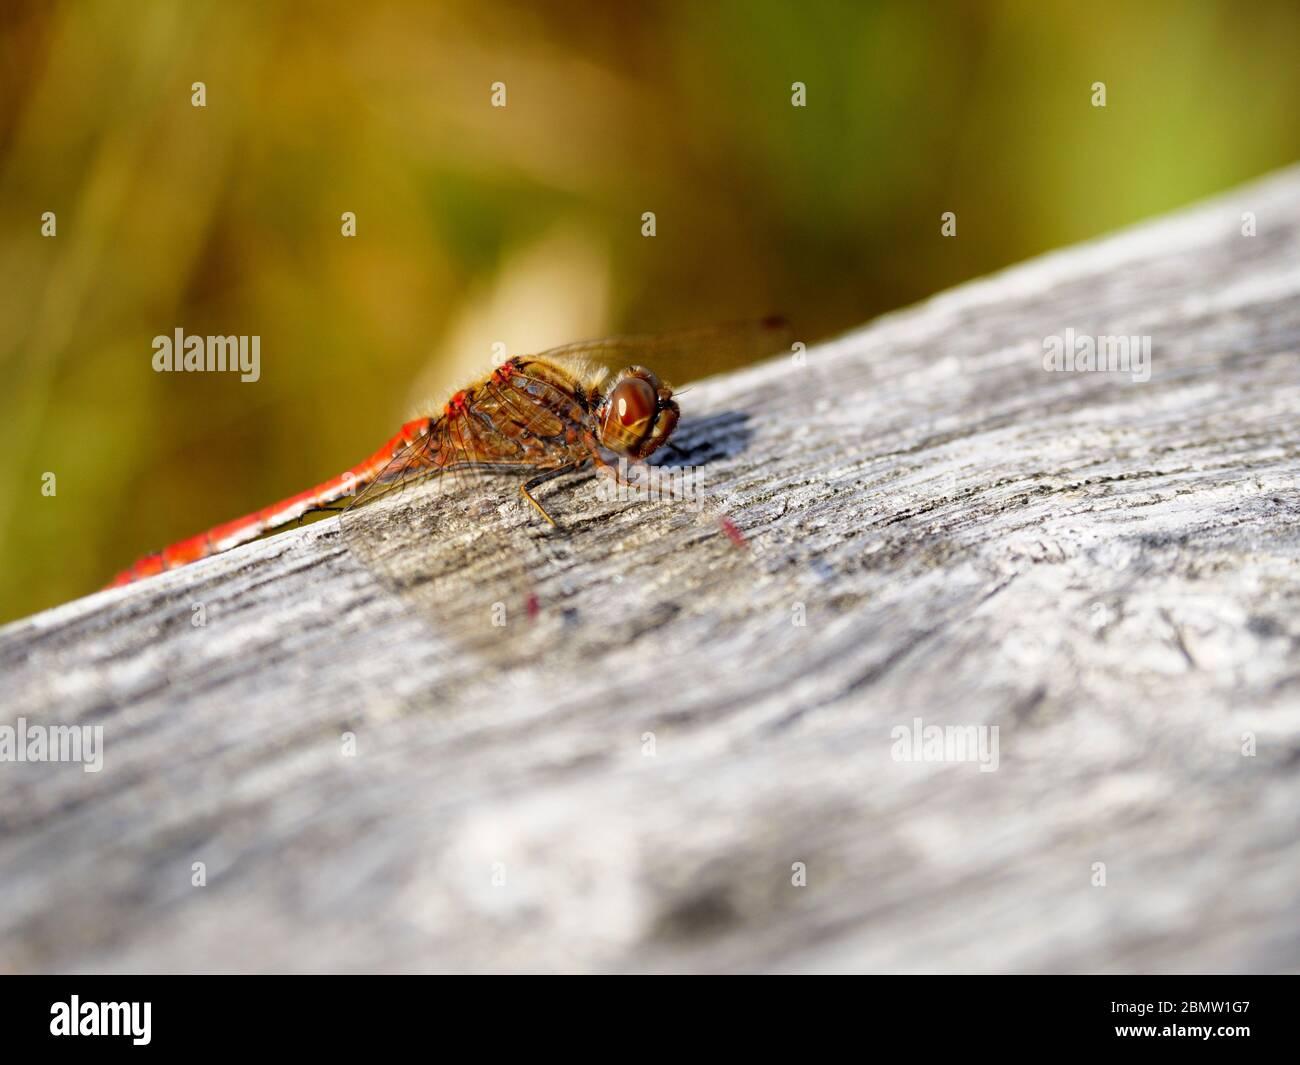 Libelle, Federsee, Naturschutzgebiet, Bad Buchau, Oberschwaben, Baden-Württemberg, Deutschland Stock Photo